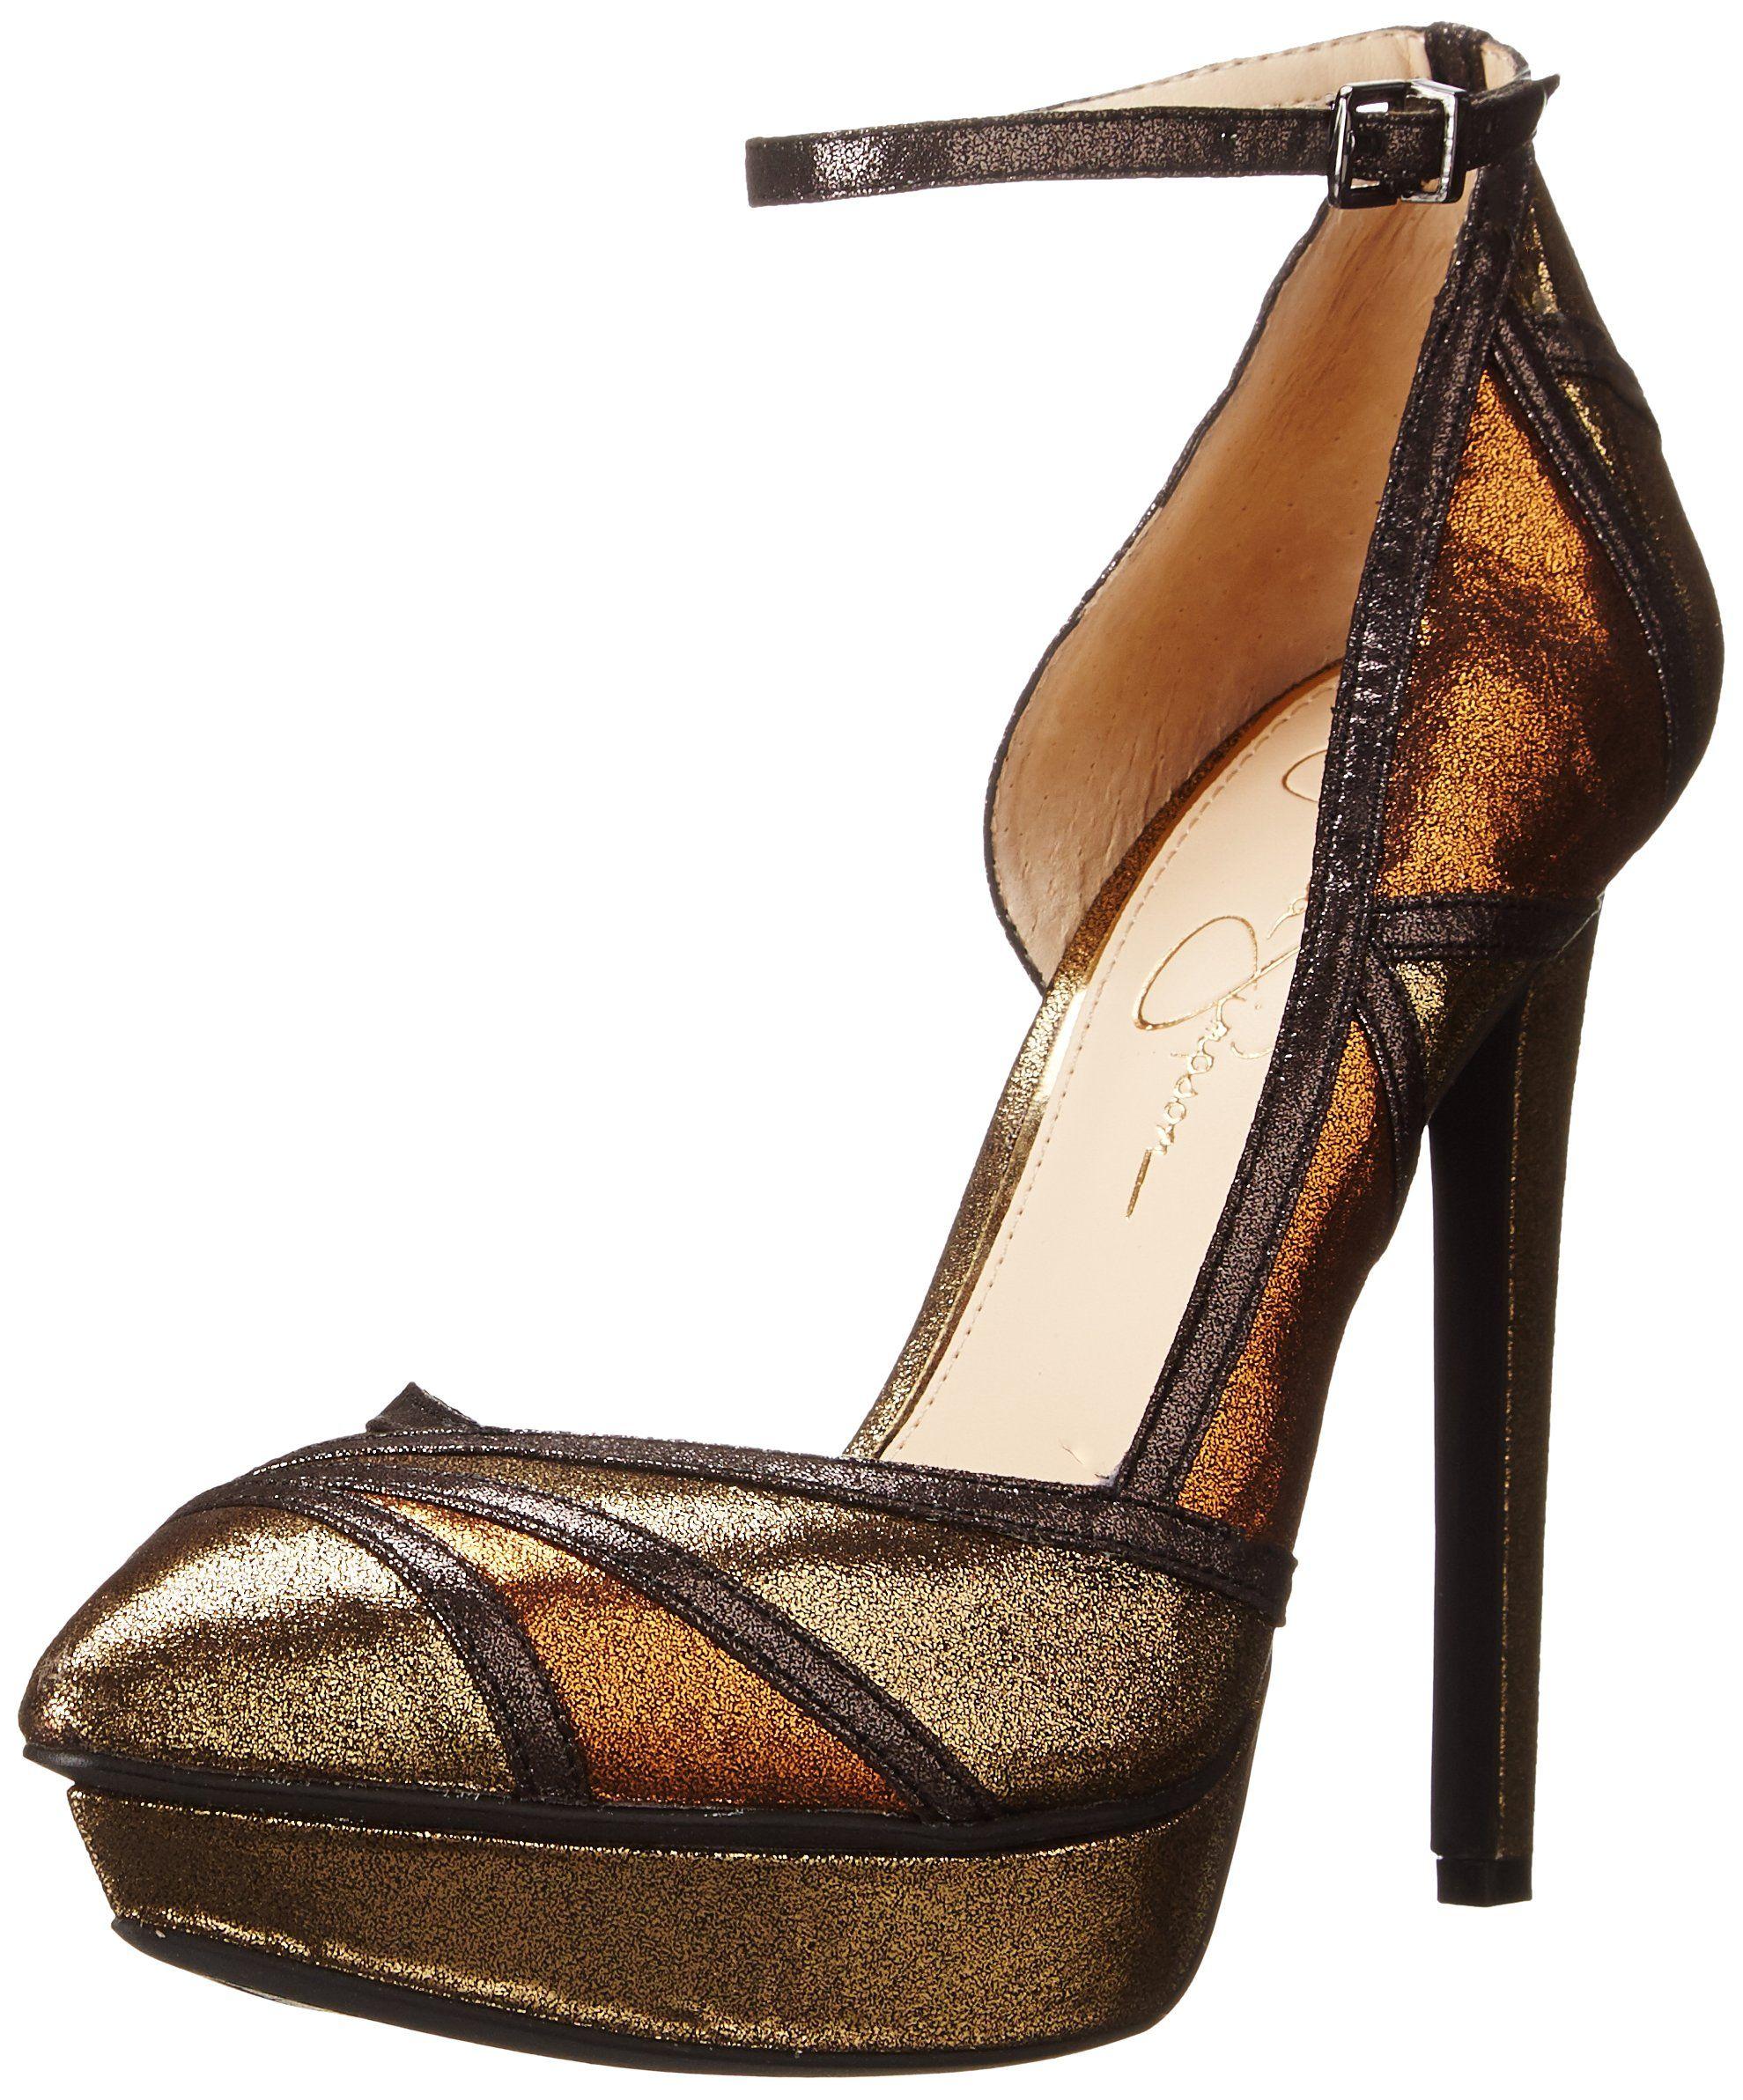 Jessica Simpson Vindie Heels   Heels, Jessica simpson